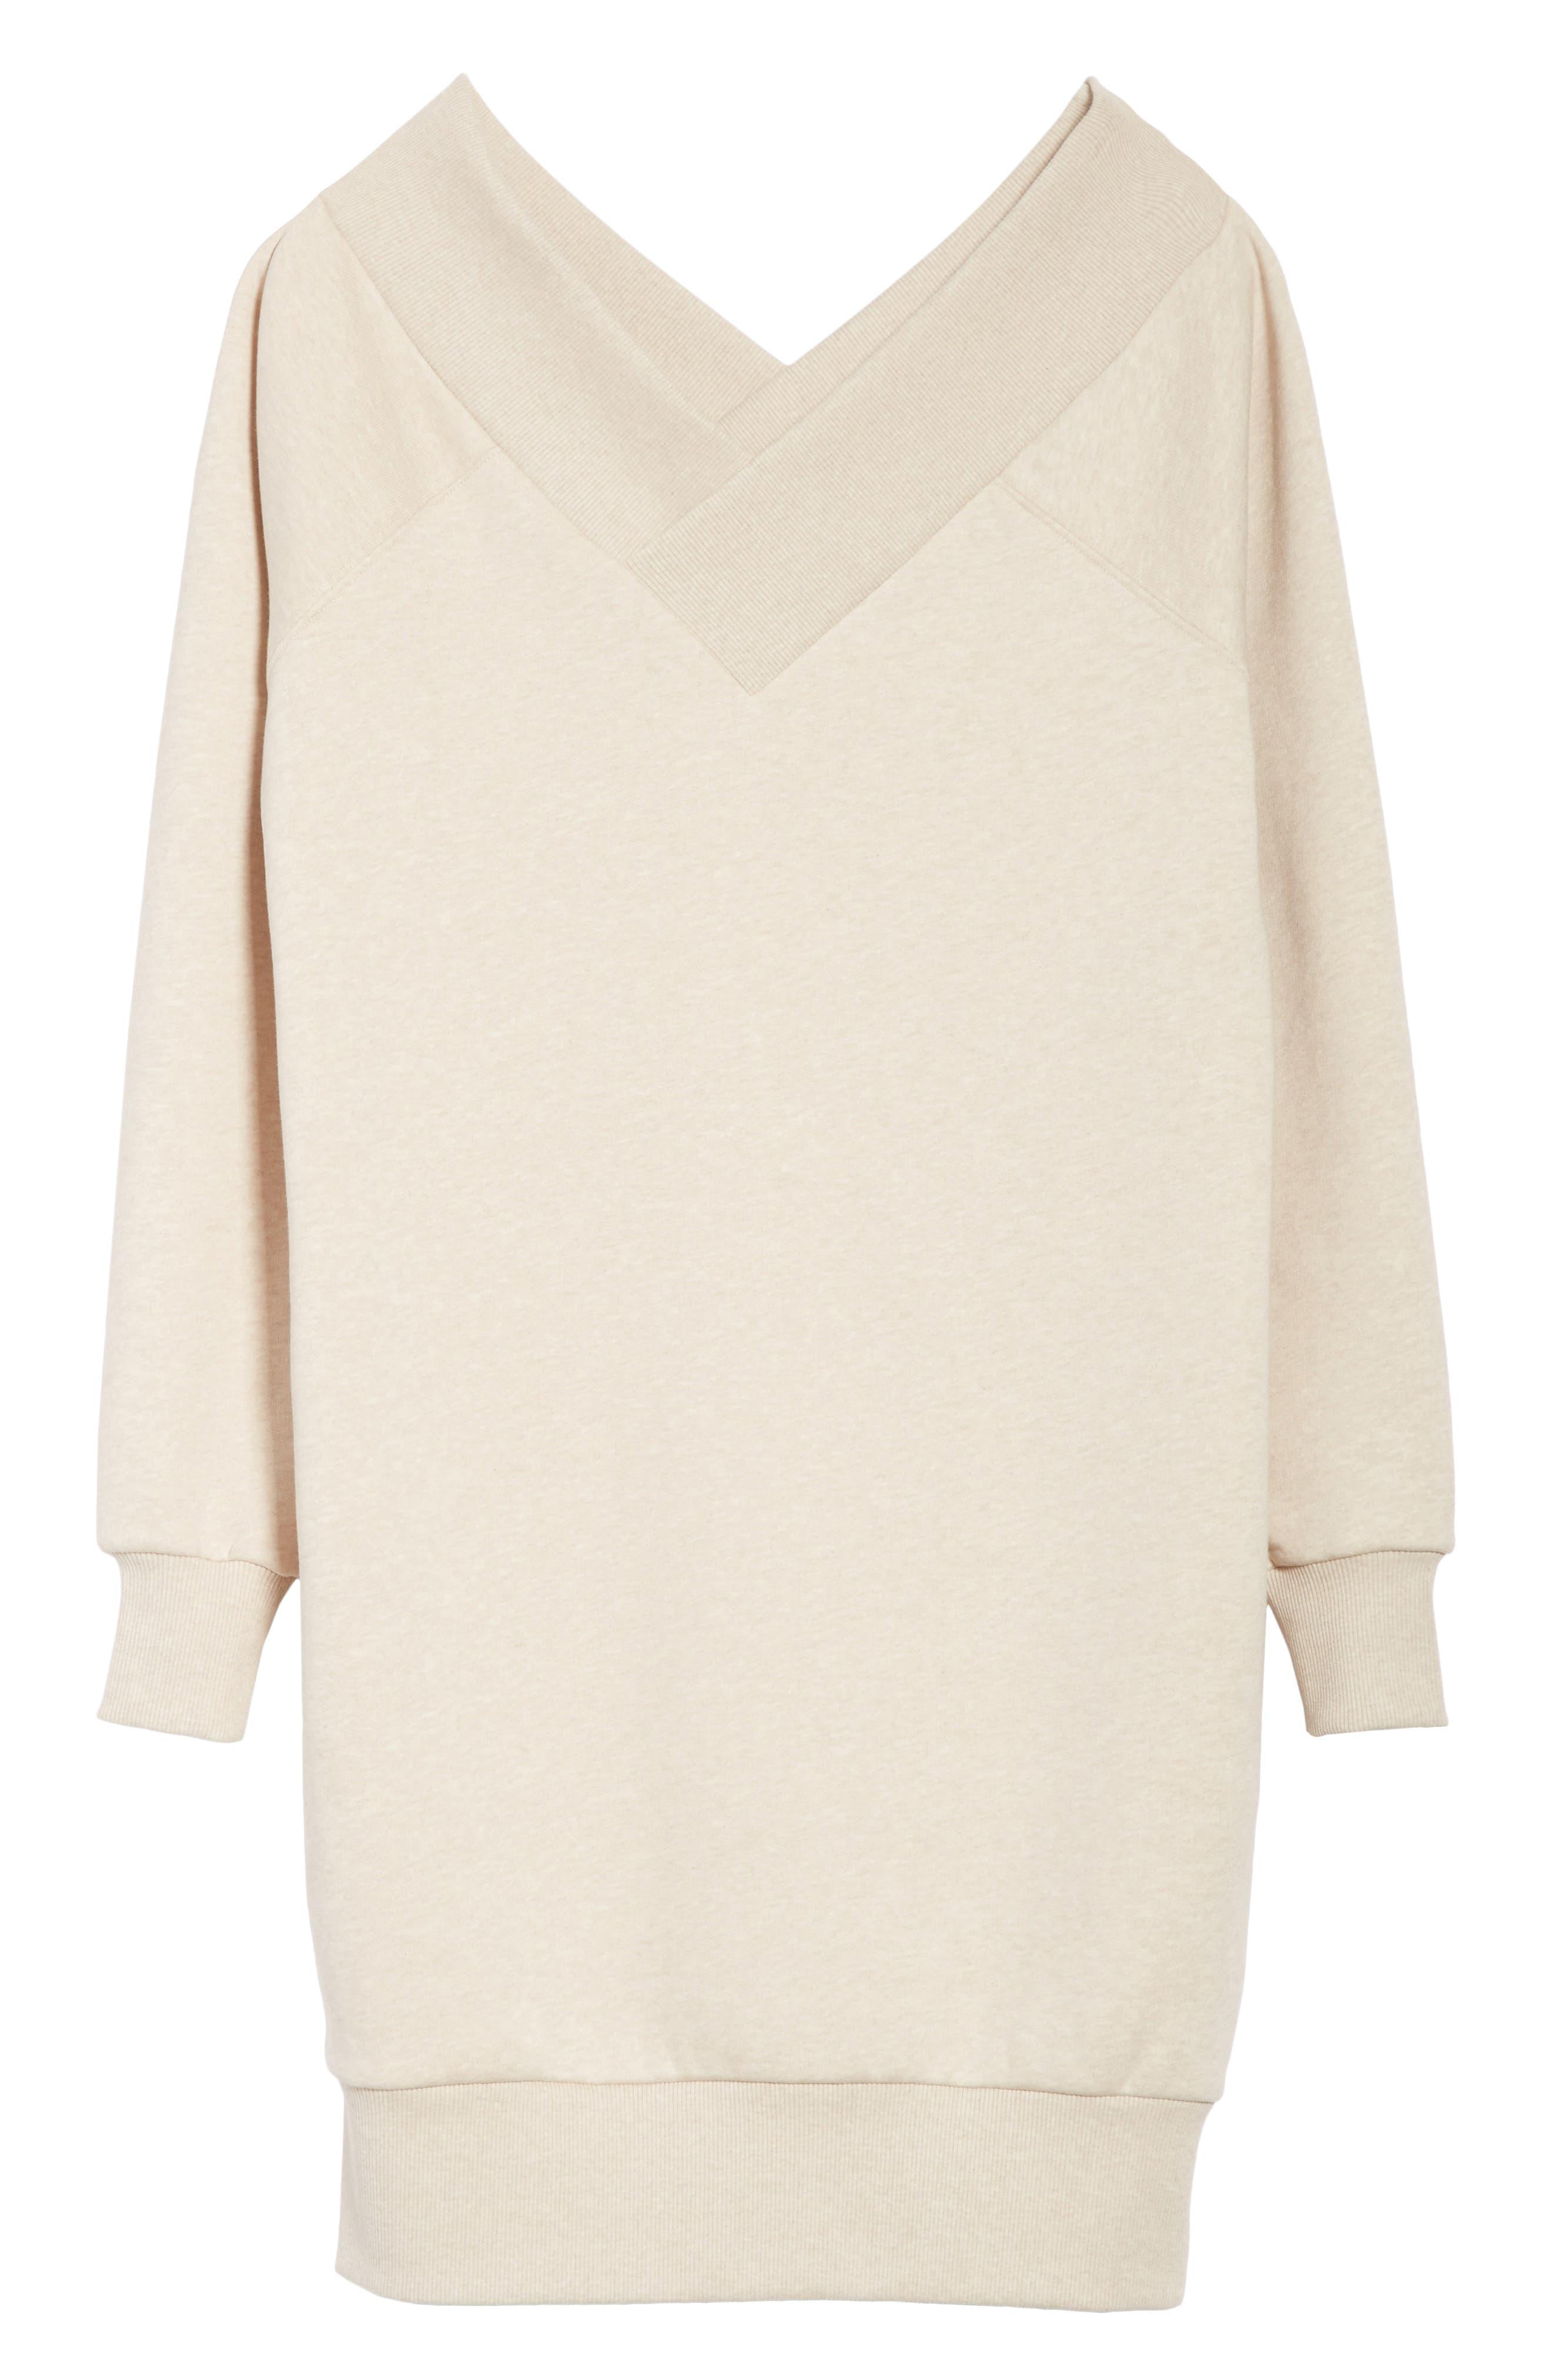 Taro Sweatshirt Dress,                             Alternate thumbnail 6, color,                             250